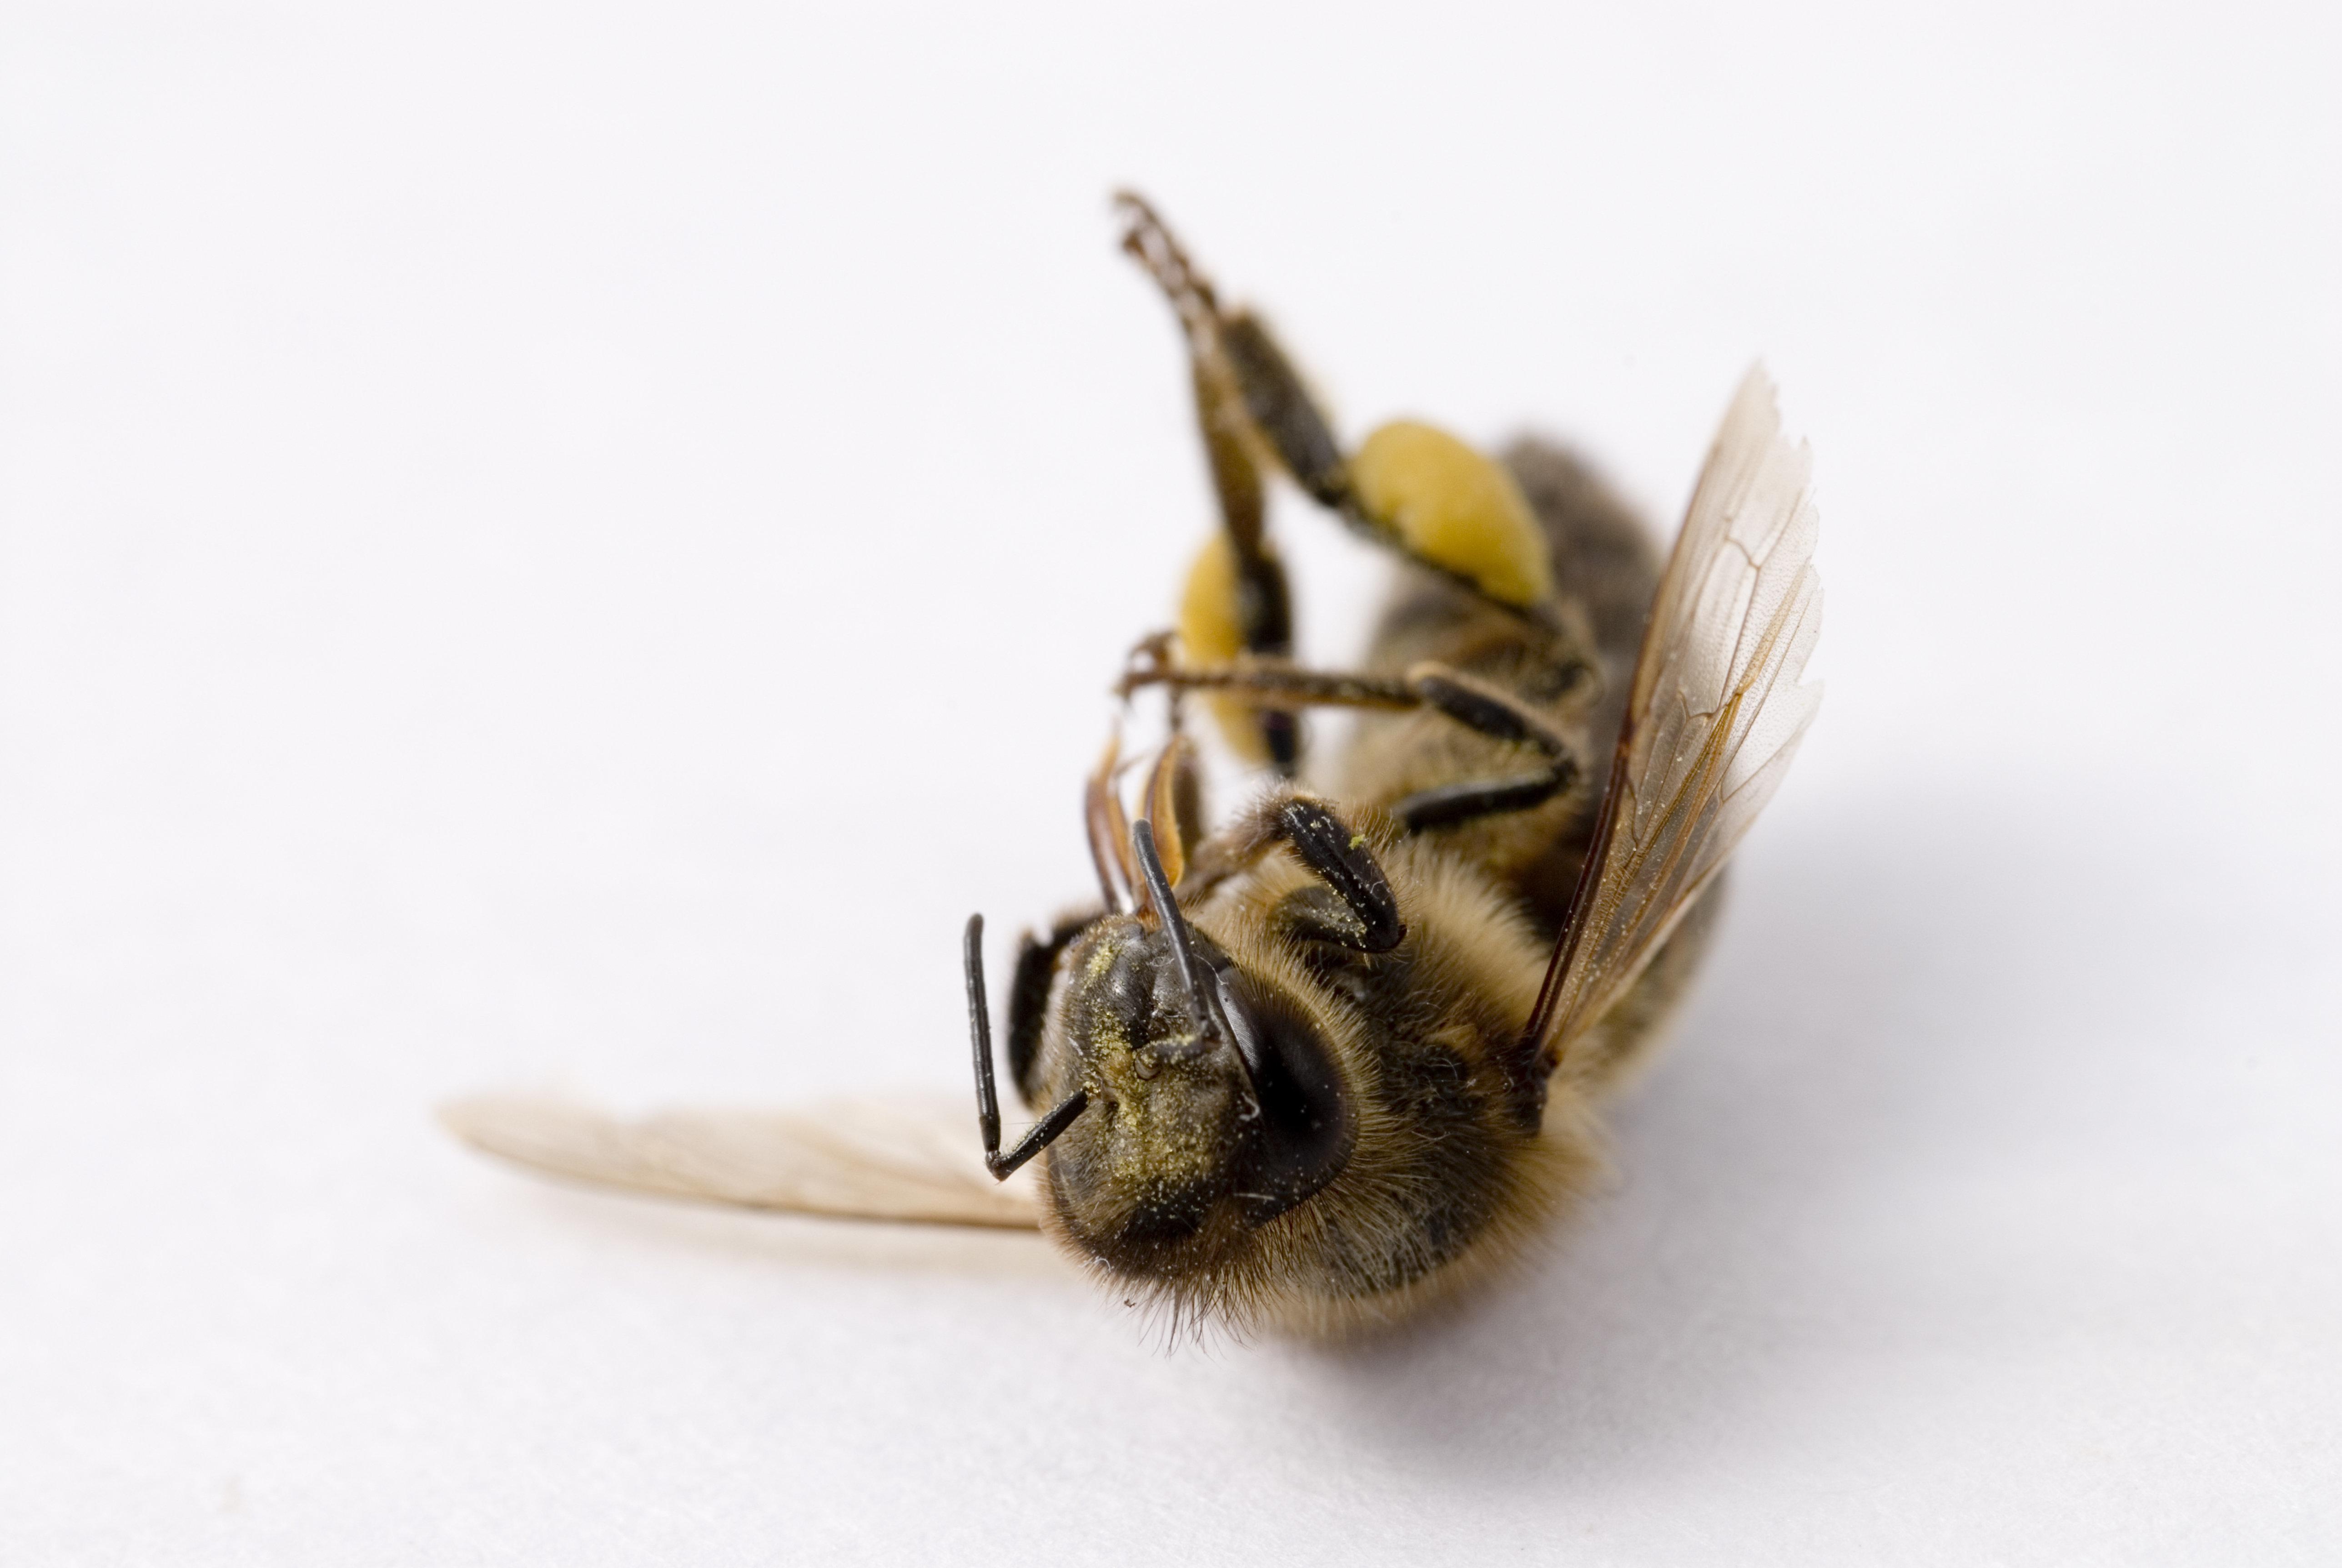 Dead Honeybee (Apis mellifera).